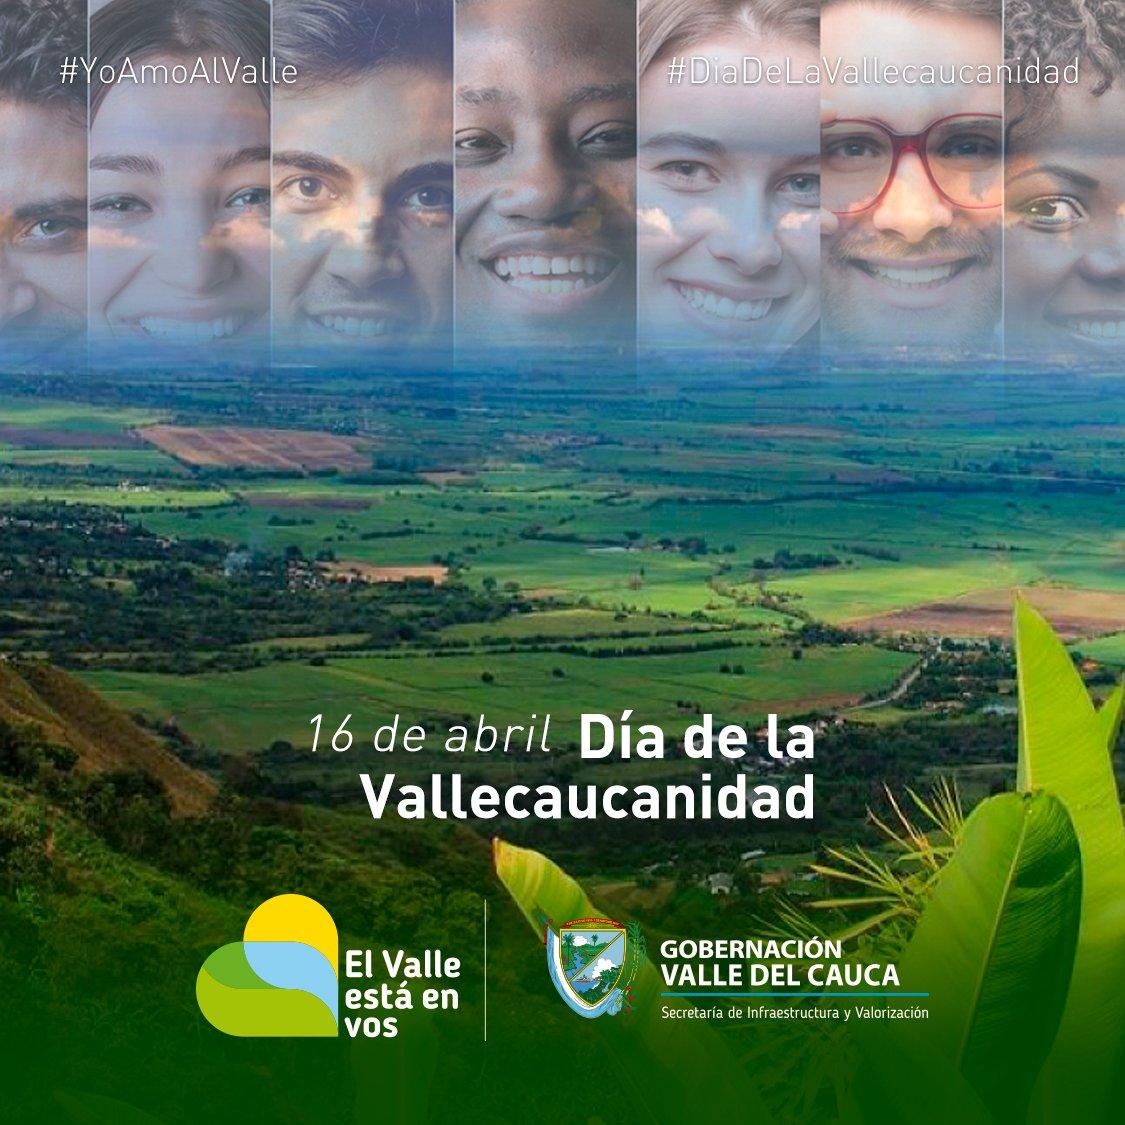 #ElValleEstaEnVos by @secinfravalle